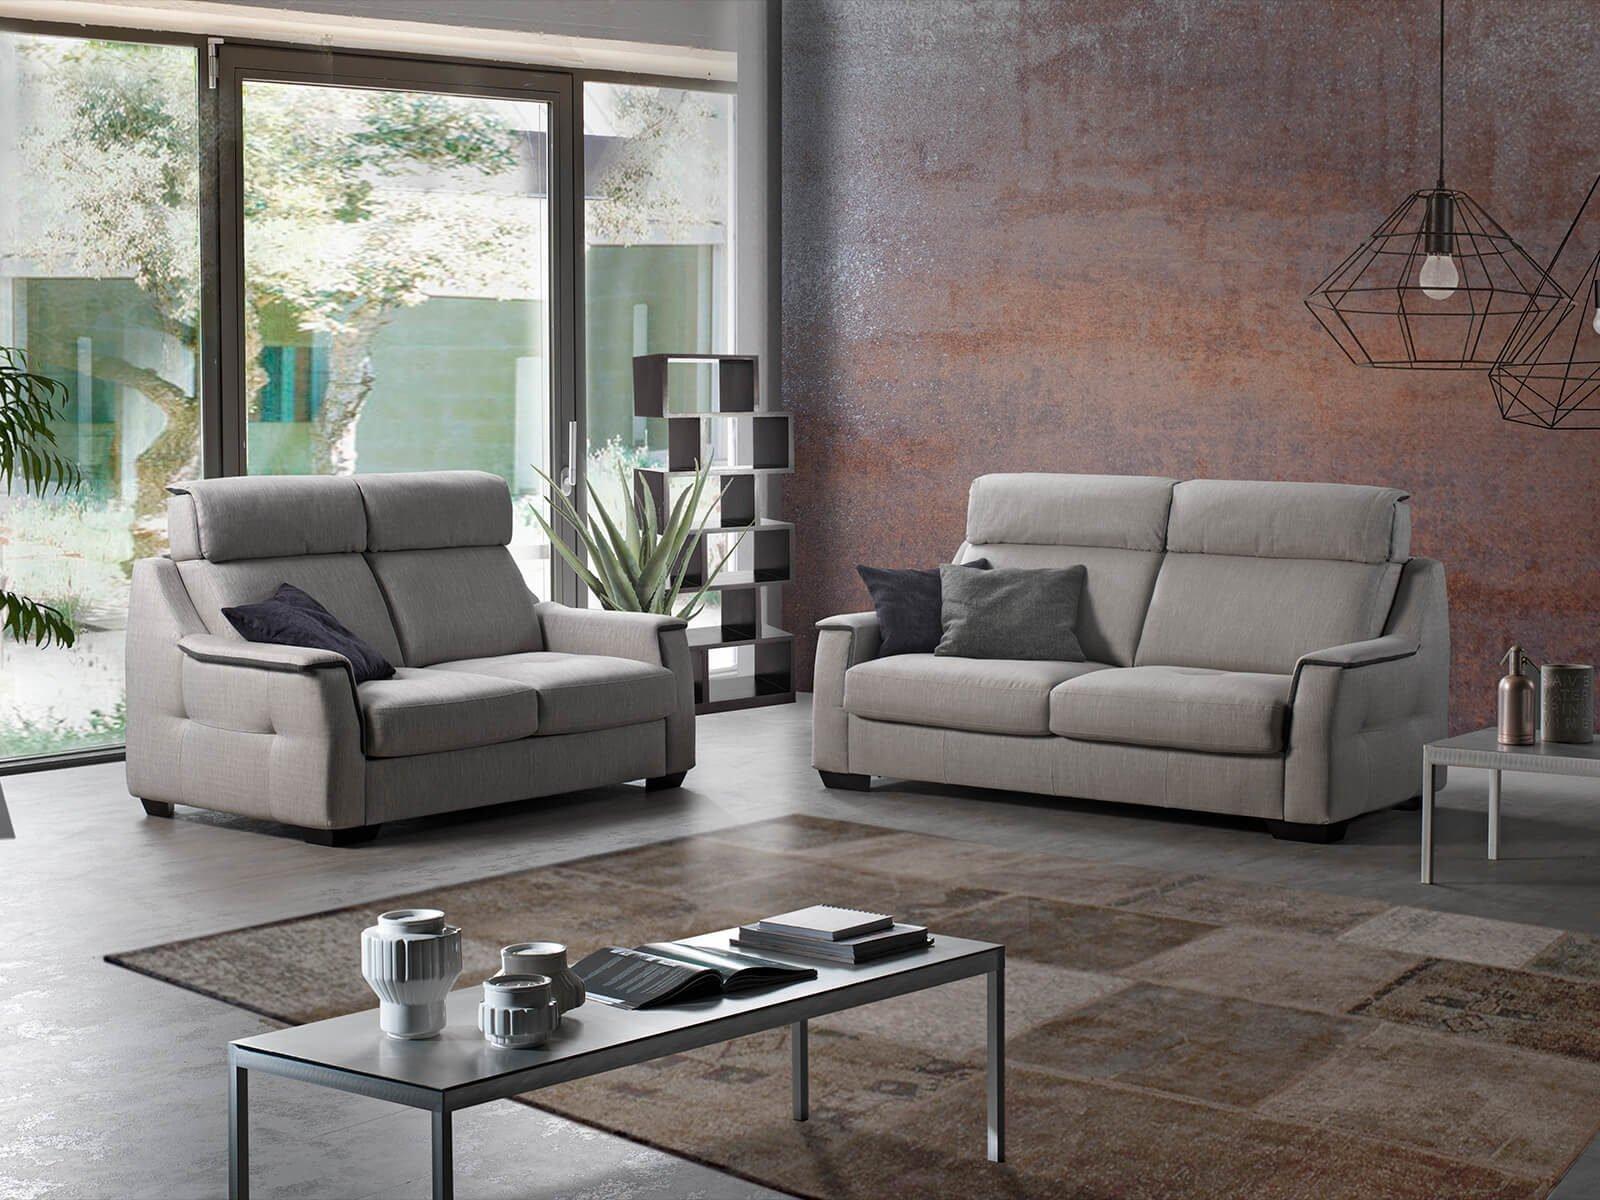 Comfort sof roma rm pratiflex for Poltrona zoe verzelloni prezzo